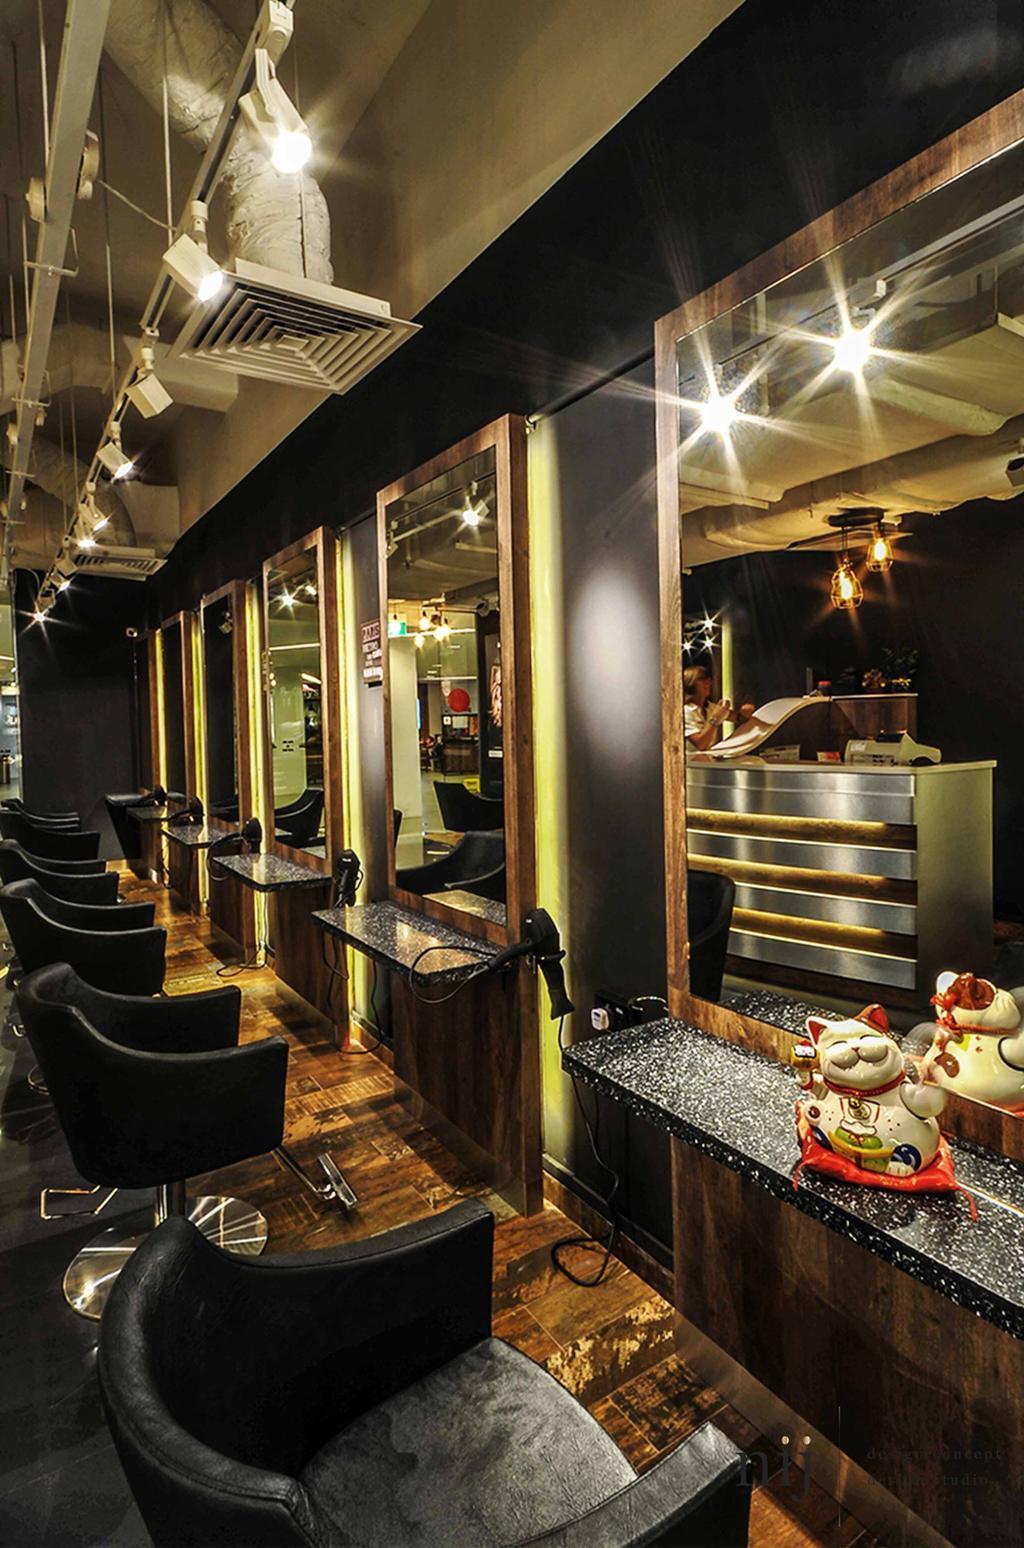 Sun Plaza Alan & Guys, Commercial, Interior Designer, NIJ Design Concept, Modern, Diner, Food, Meal, Restaurant, Cake, Dessert, Torte, Chair, Furniture